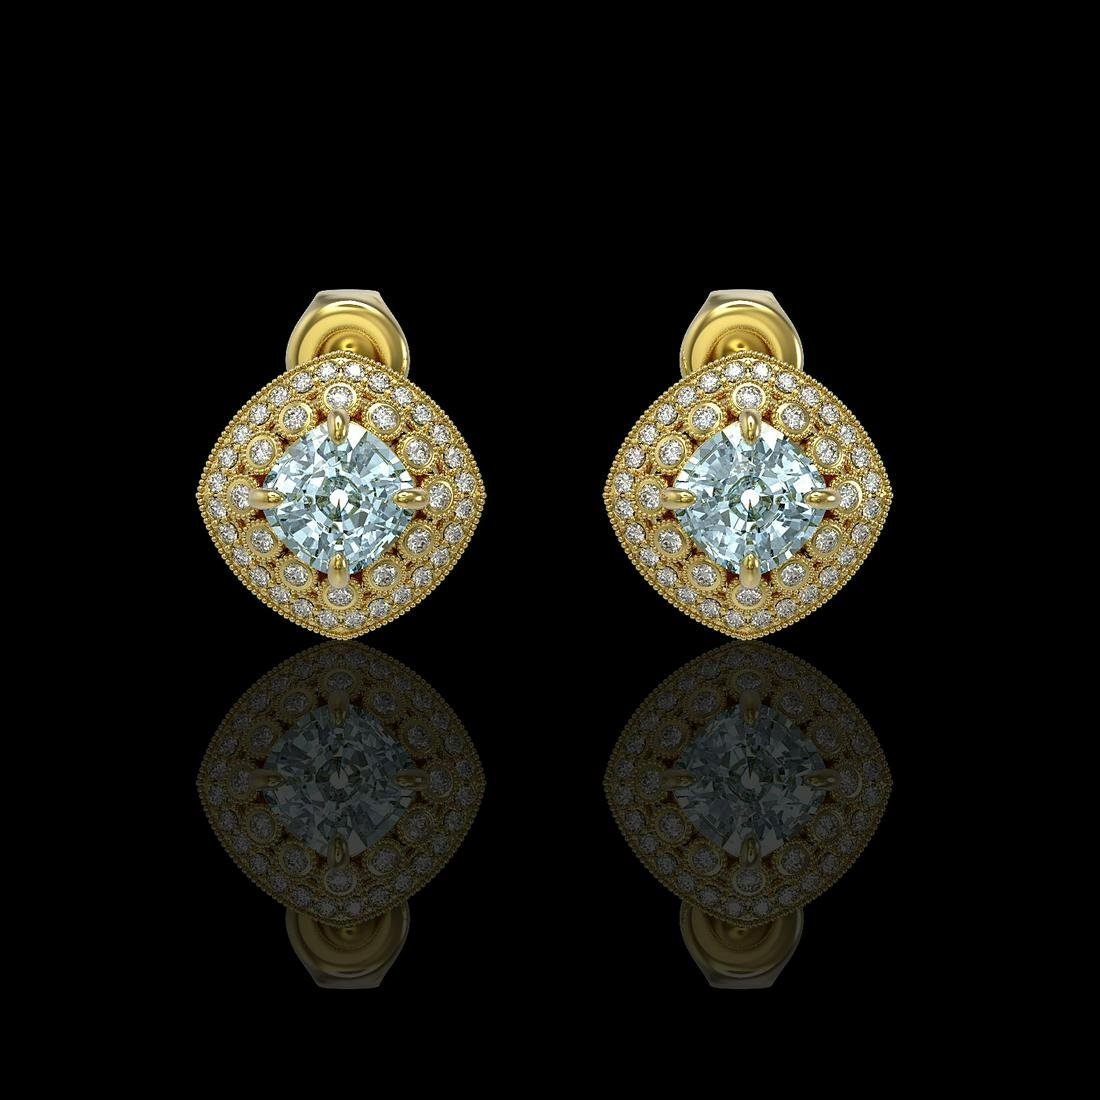 4.39 ctw Aquamarine & Diamond Earrings 14K Yellow Gold